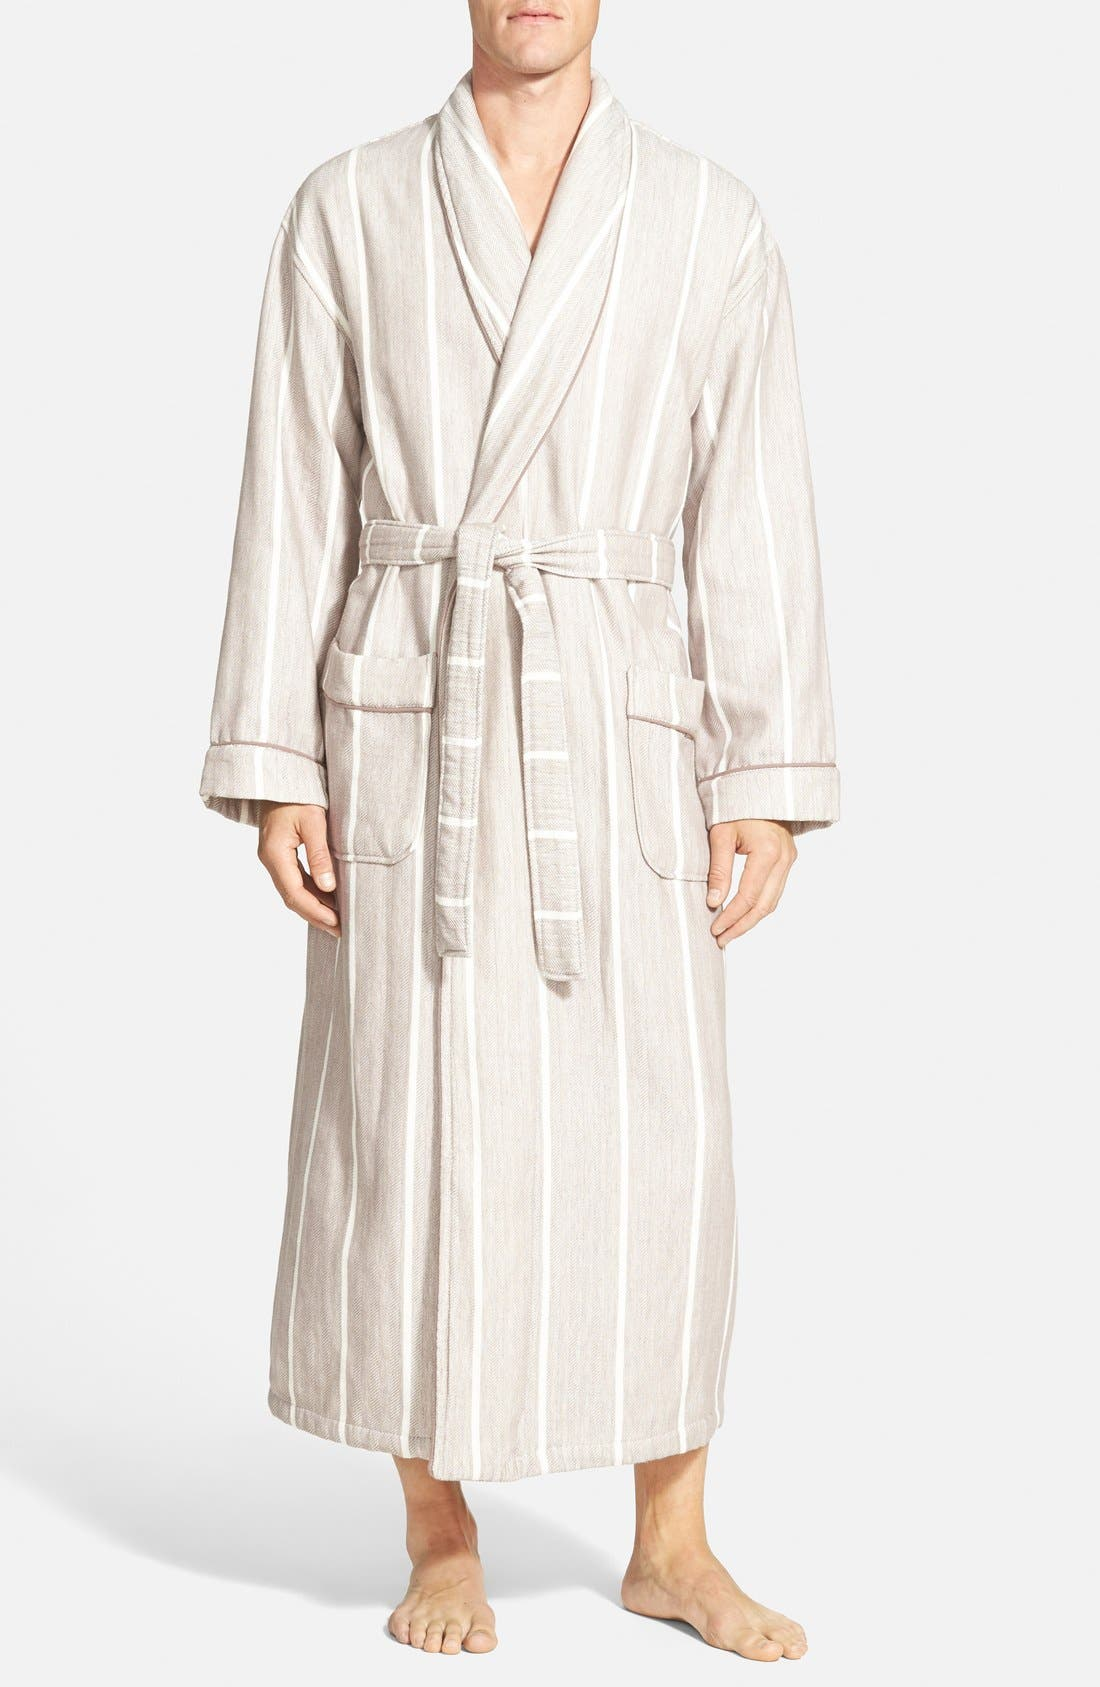 Main Image - Majestic International 'Breakers' Herringbone Cotton Robe